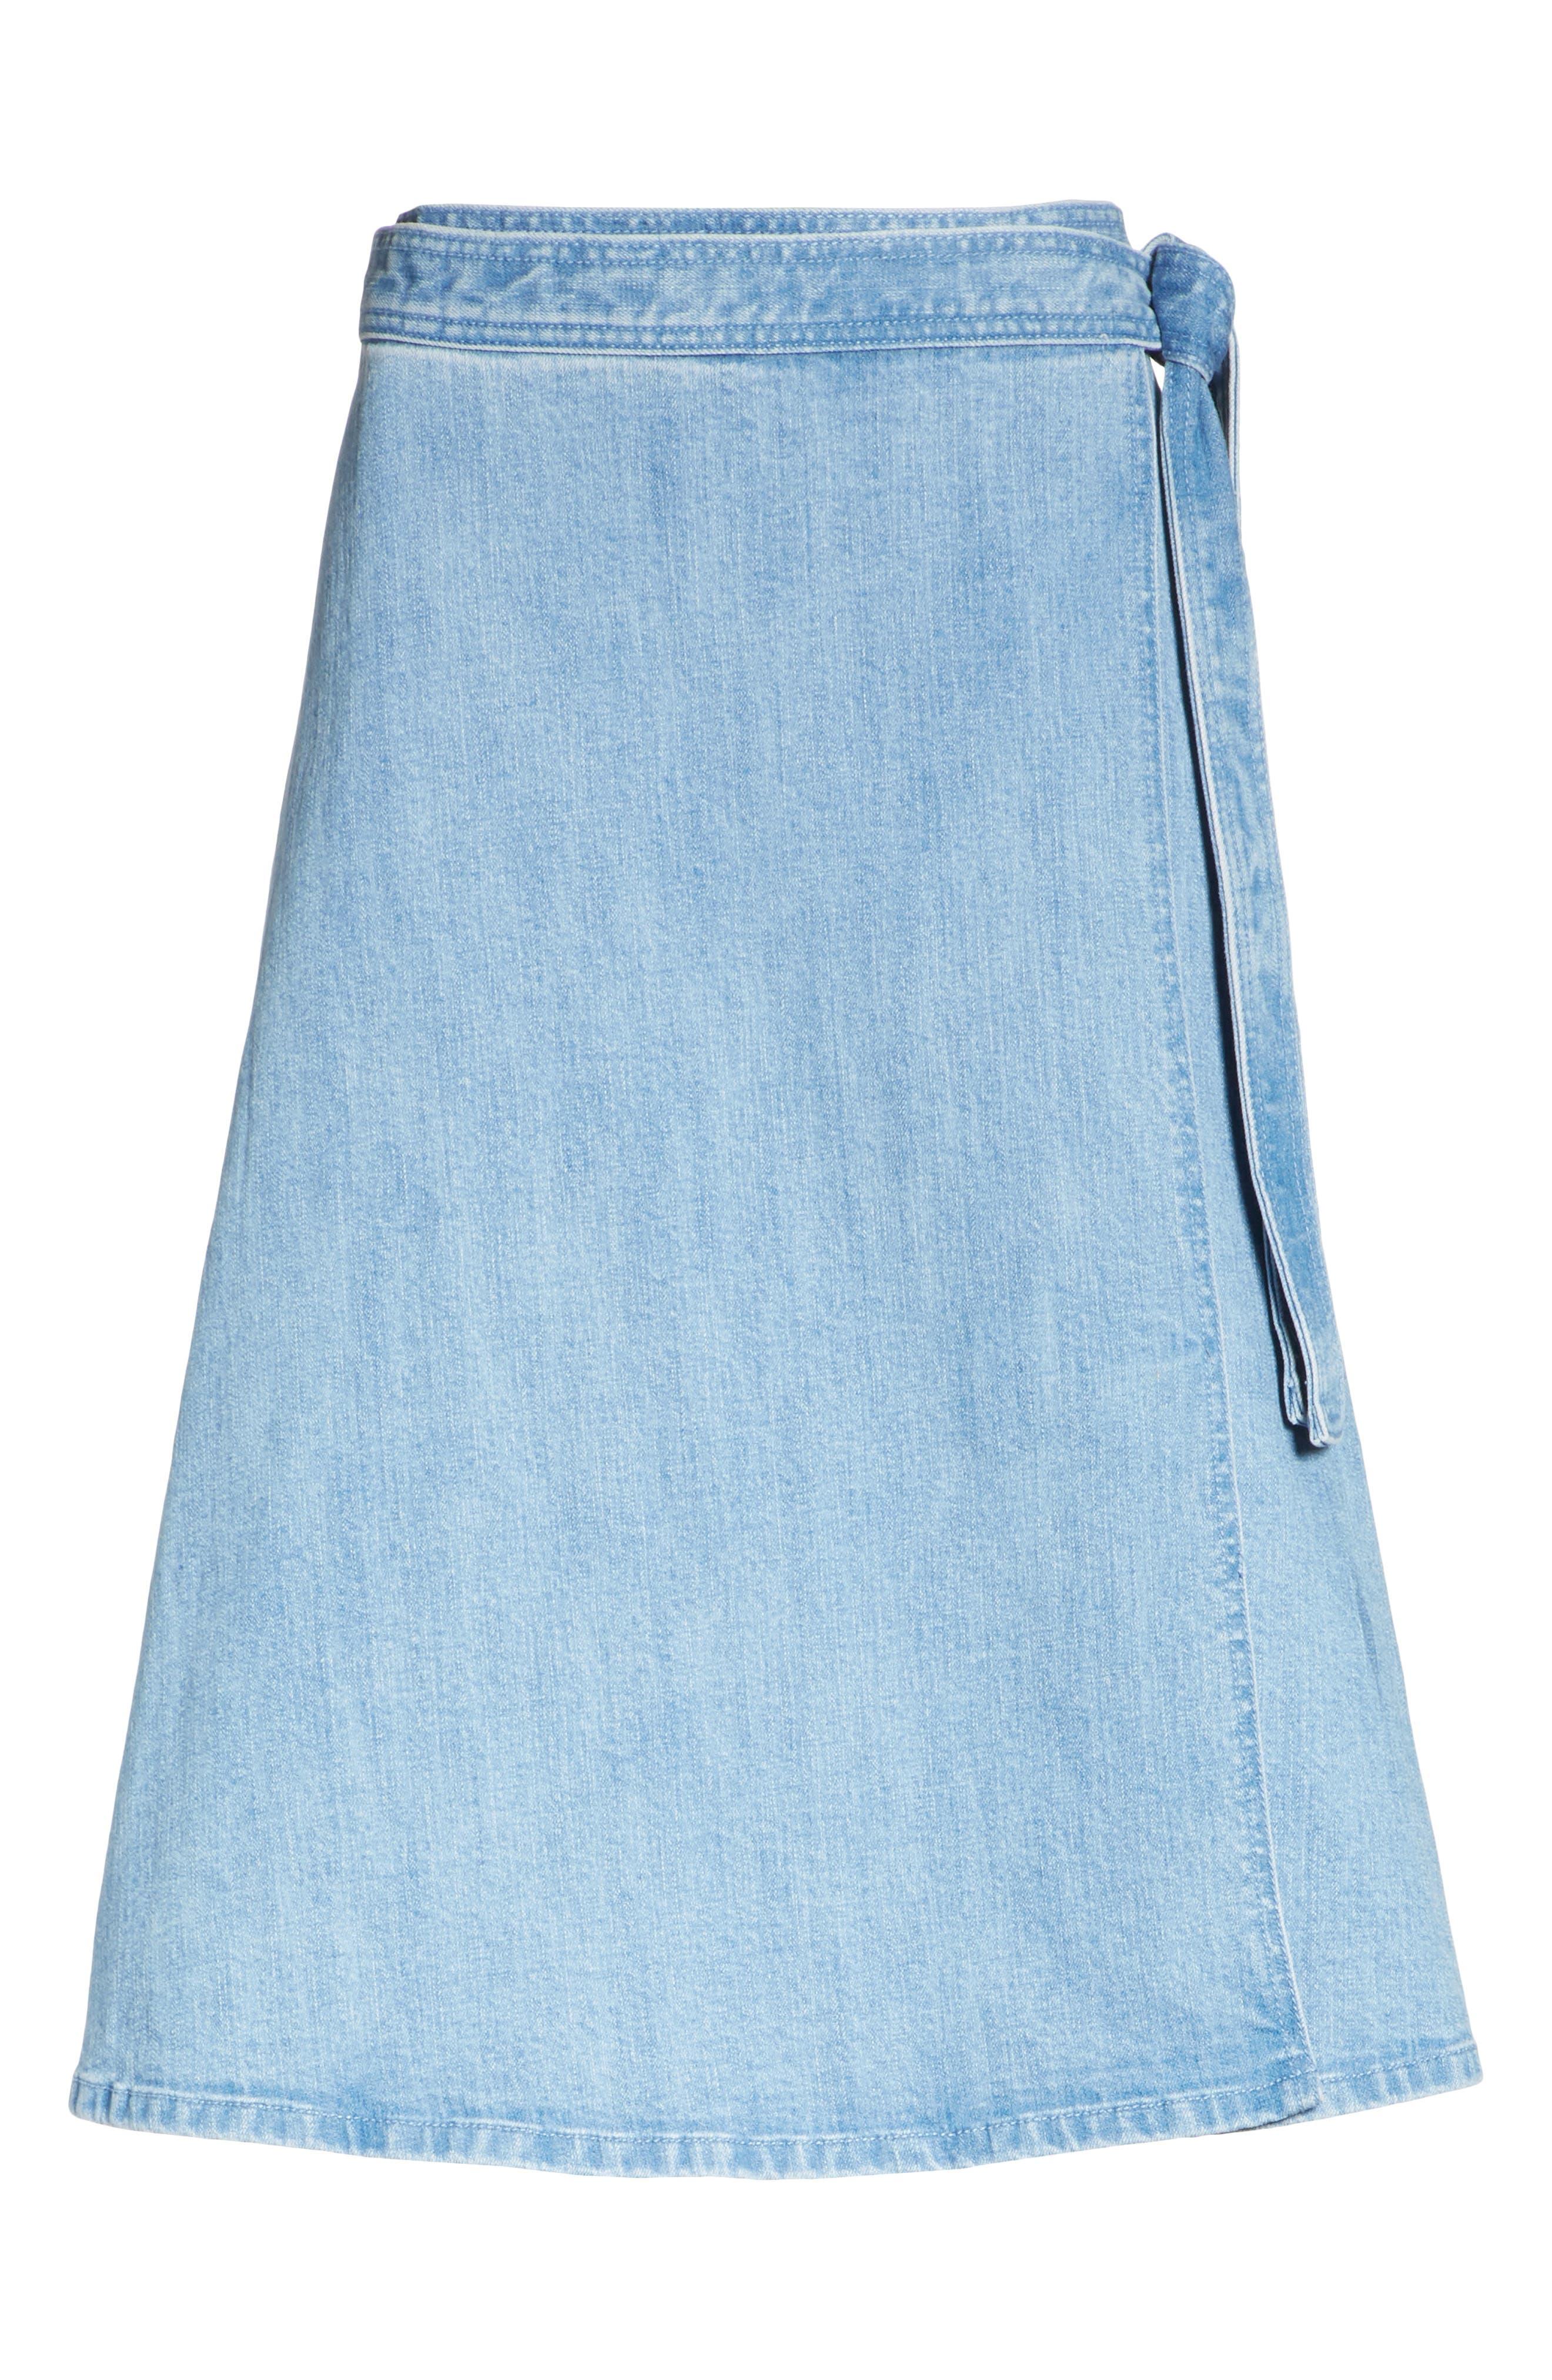 vintage stretch denim wrap skirt,                             Alternate thumbnail 6, color,                             Indigo